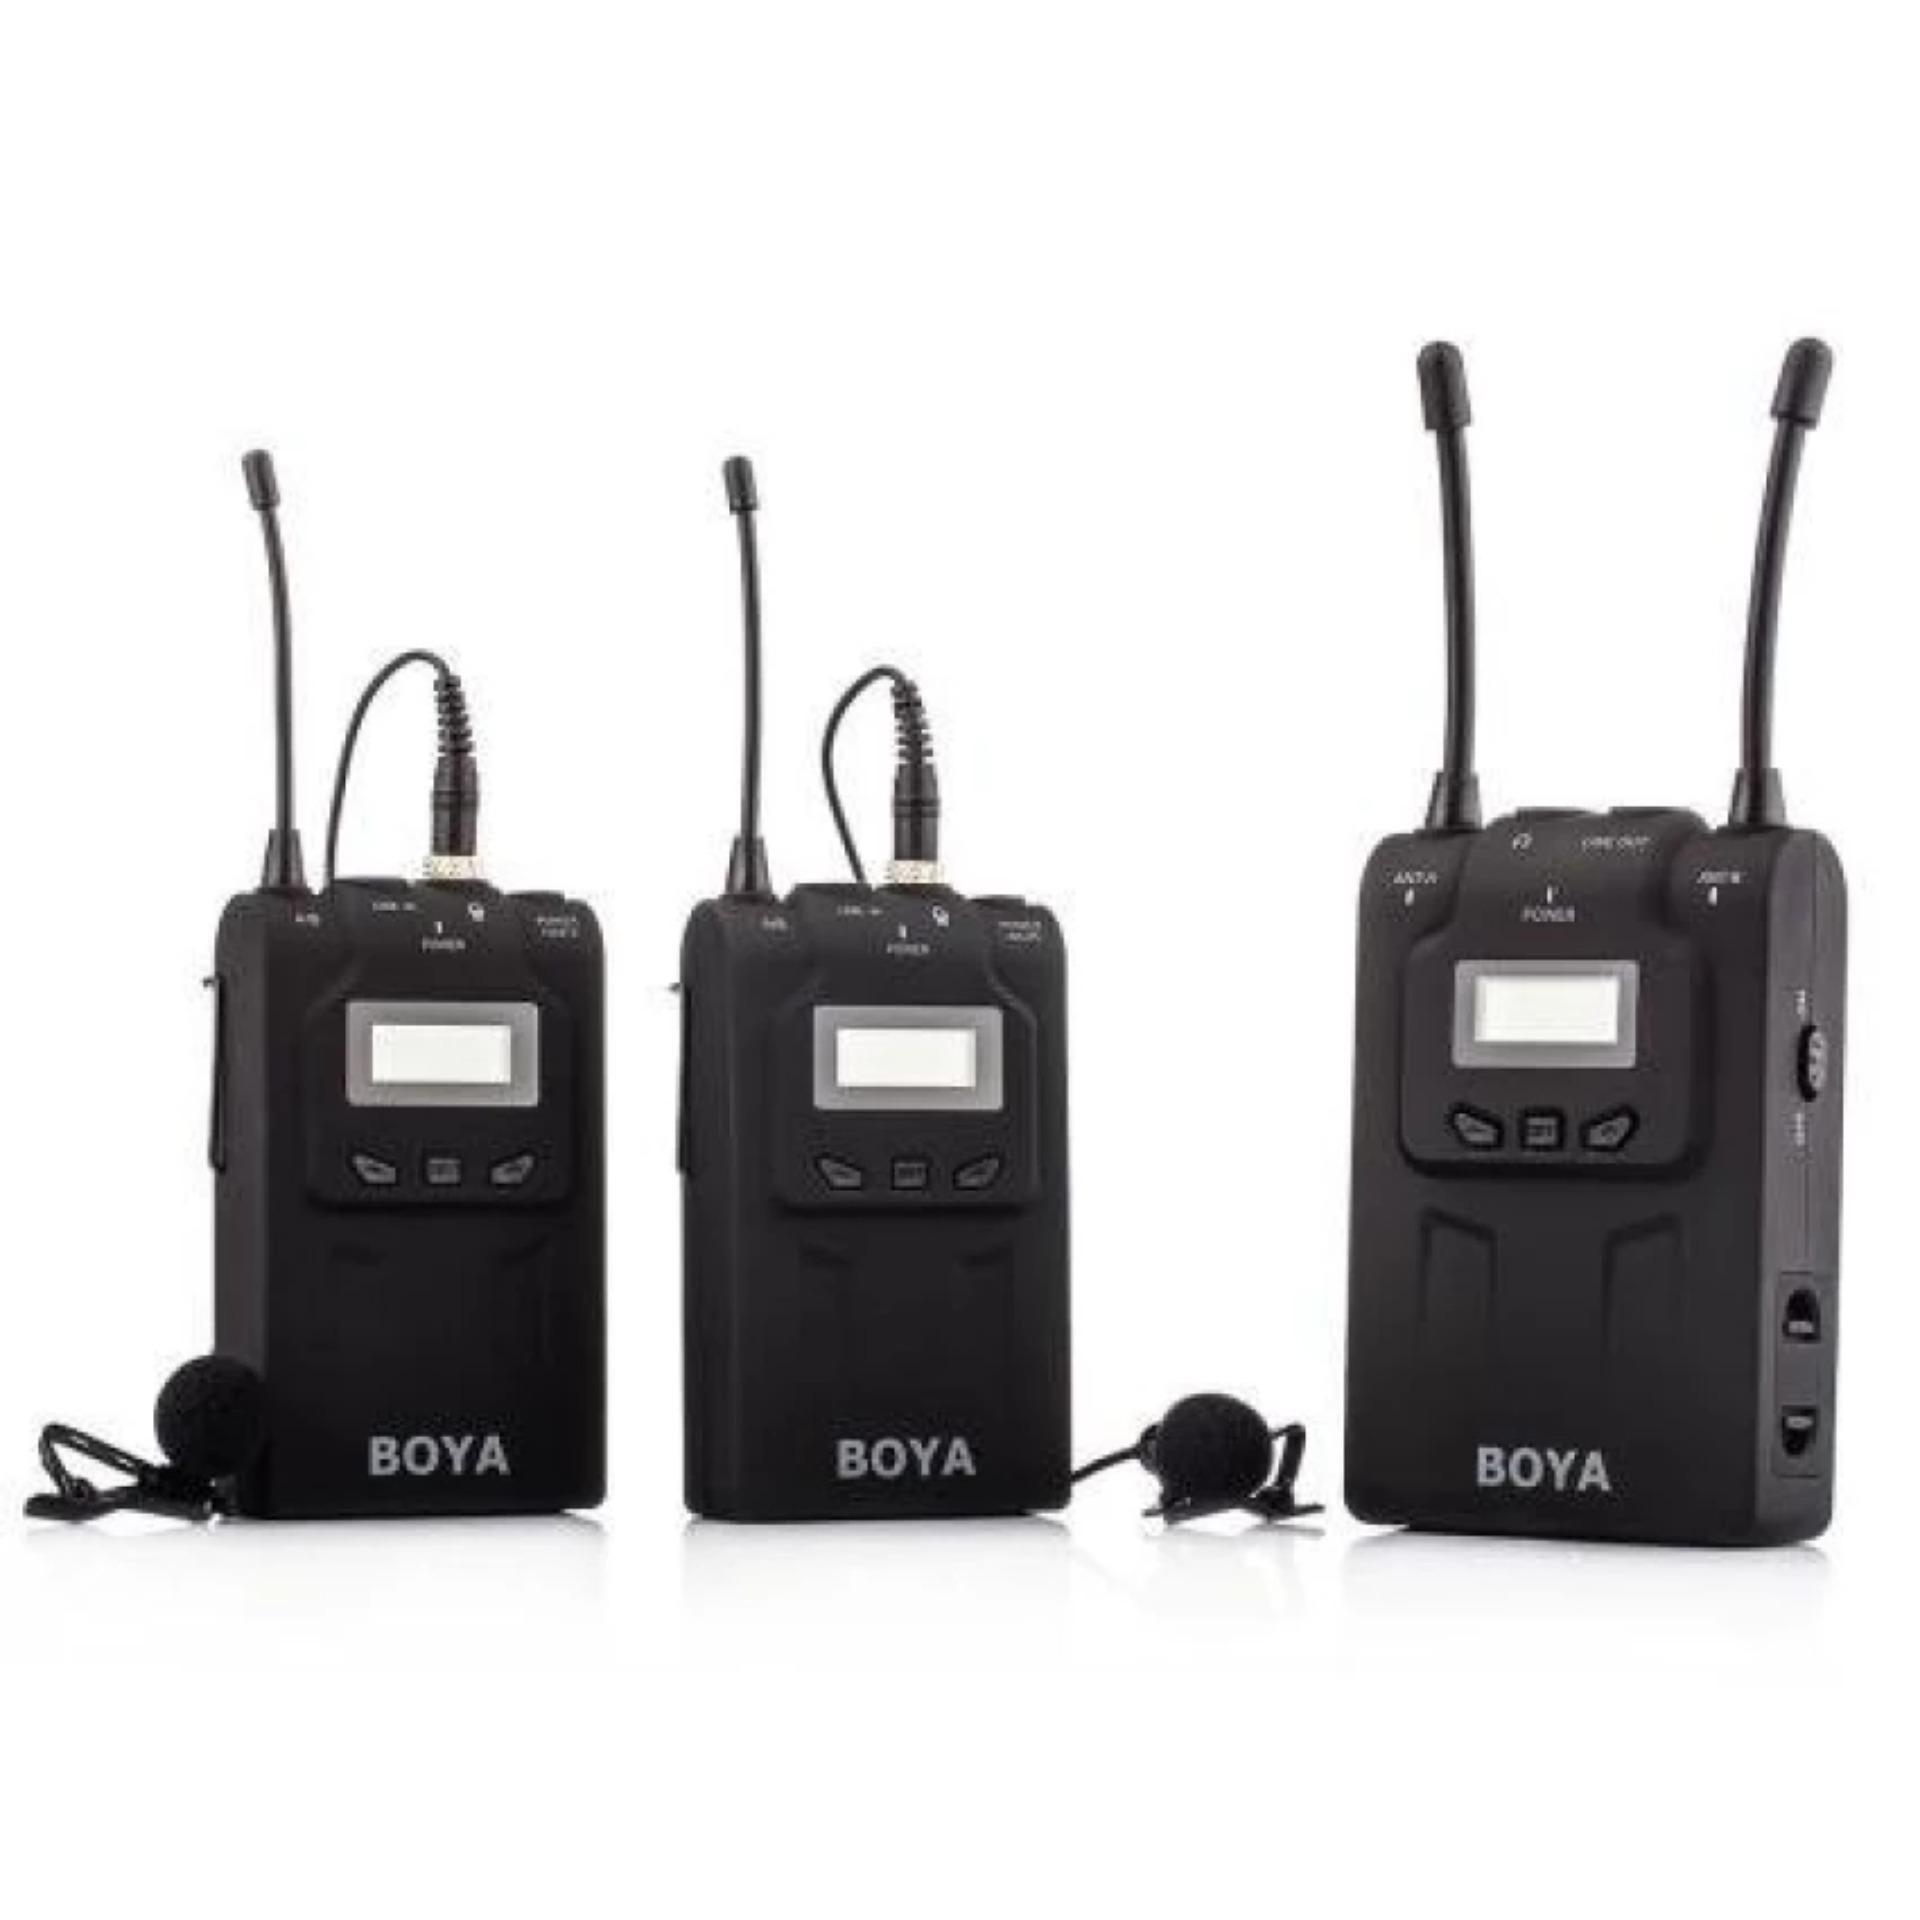 Jual Boya By Wm8 Wireless Microphone Hitam Online Dki Jakarta